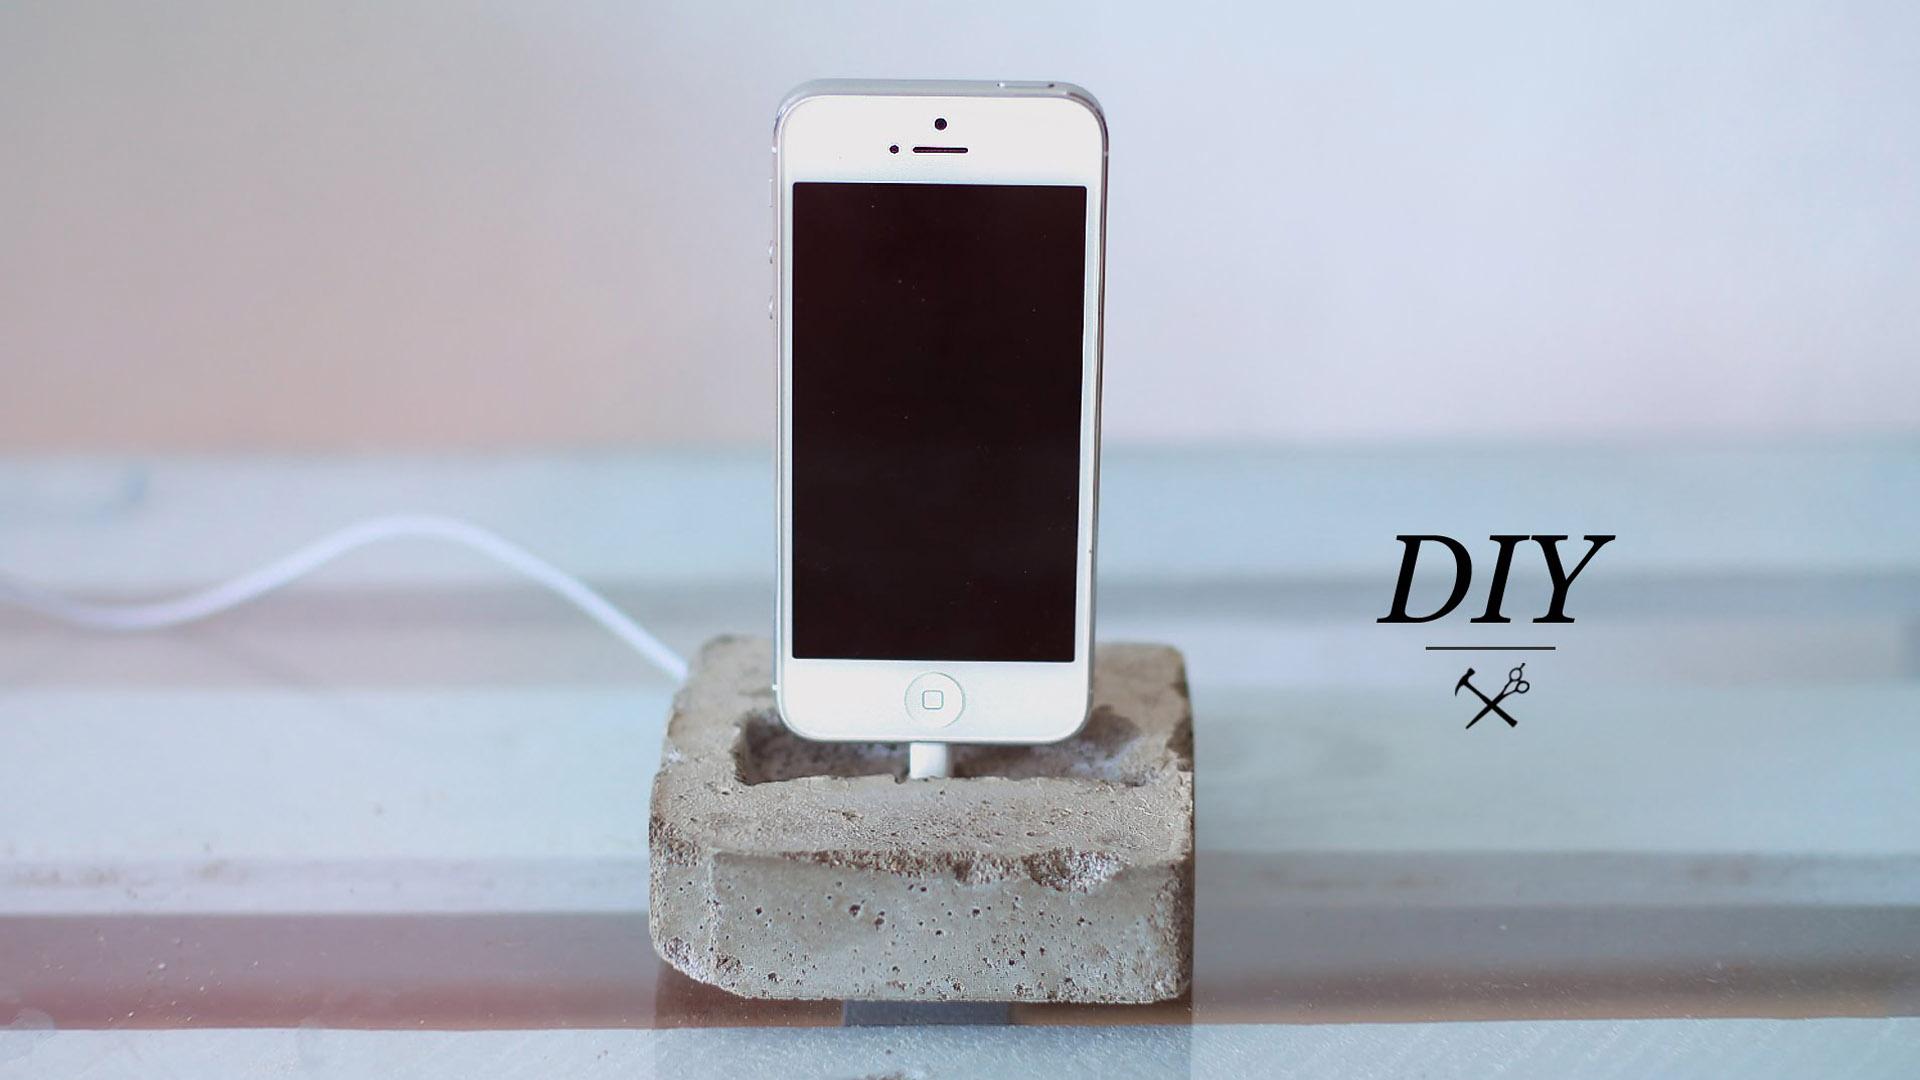 DIY CONCRETE PHONE DOCK